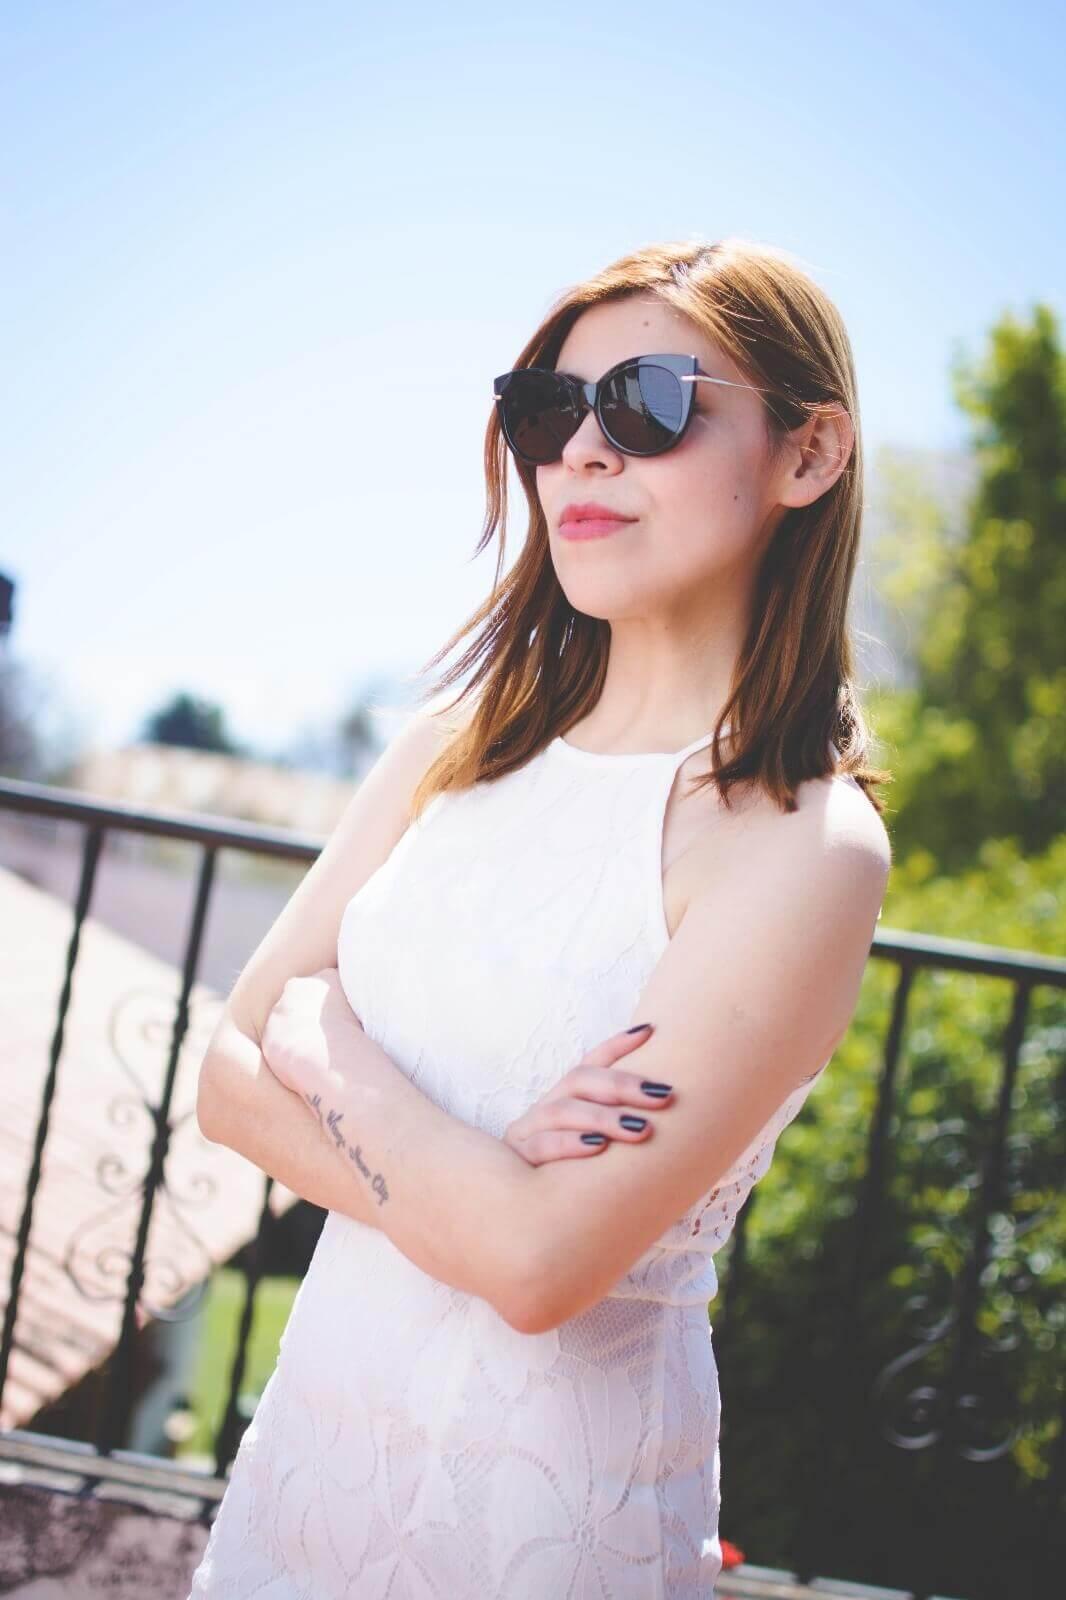 gamiss-white-lace-dress-halter-neck-dresses-cocktail-dresses-2016-zaful-black-suede-stilettos-deborah-ferrero-style-by-deb03